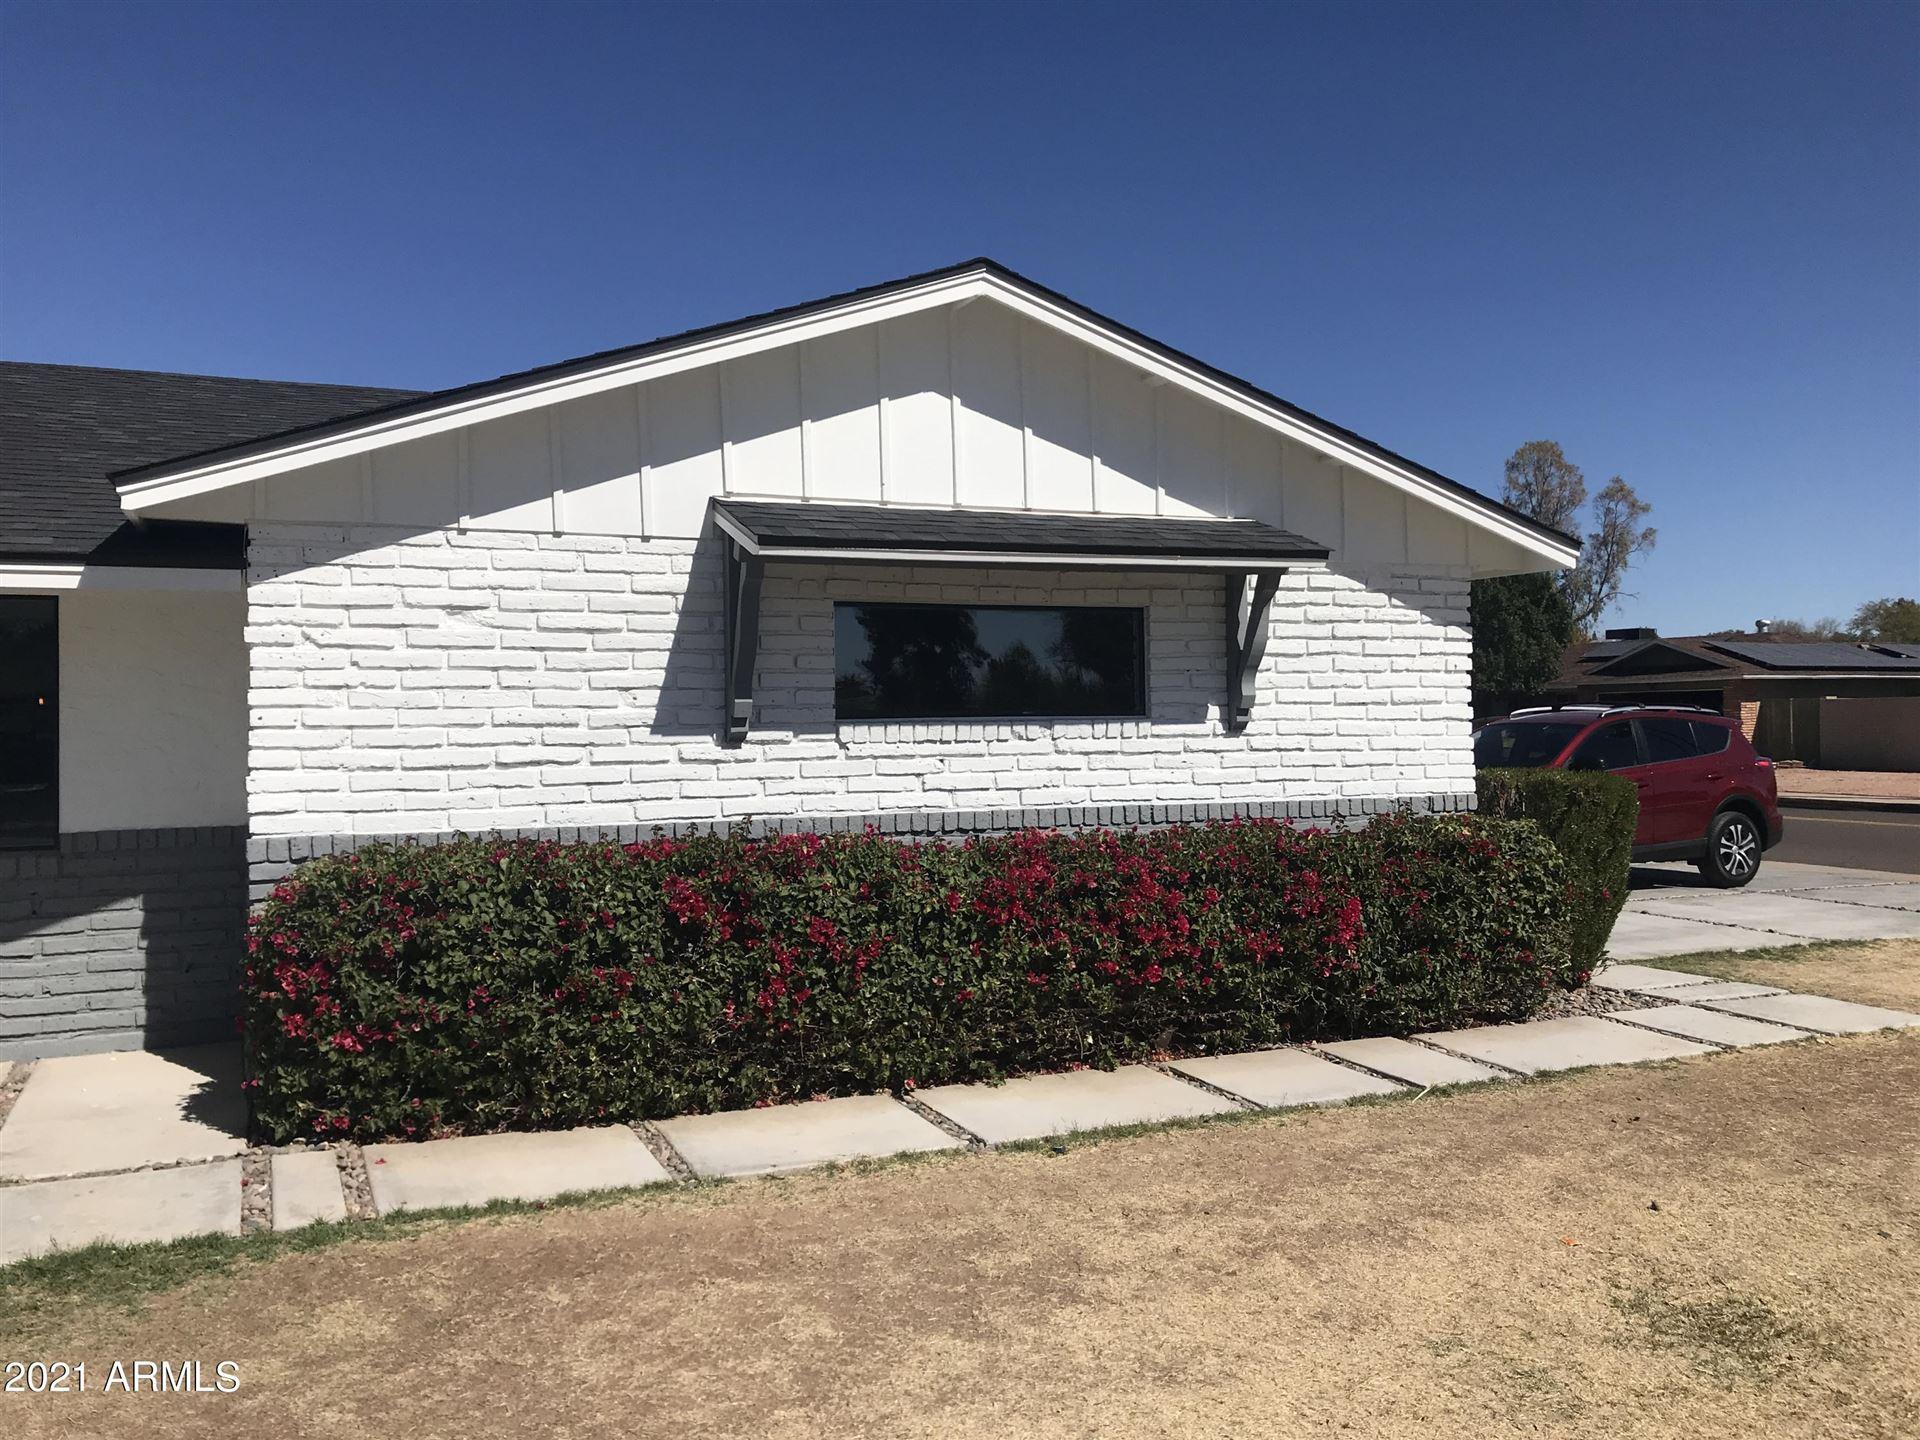 Photo of 8560 E CAMELBACK Road, Scottsdale, AZ 85251 (MLS # 6201052)